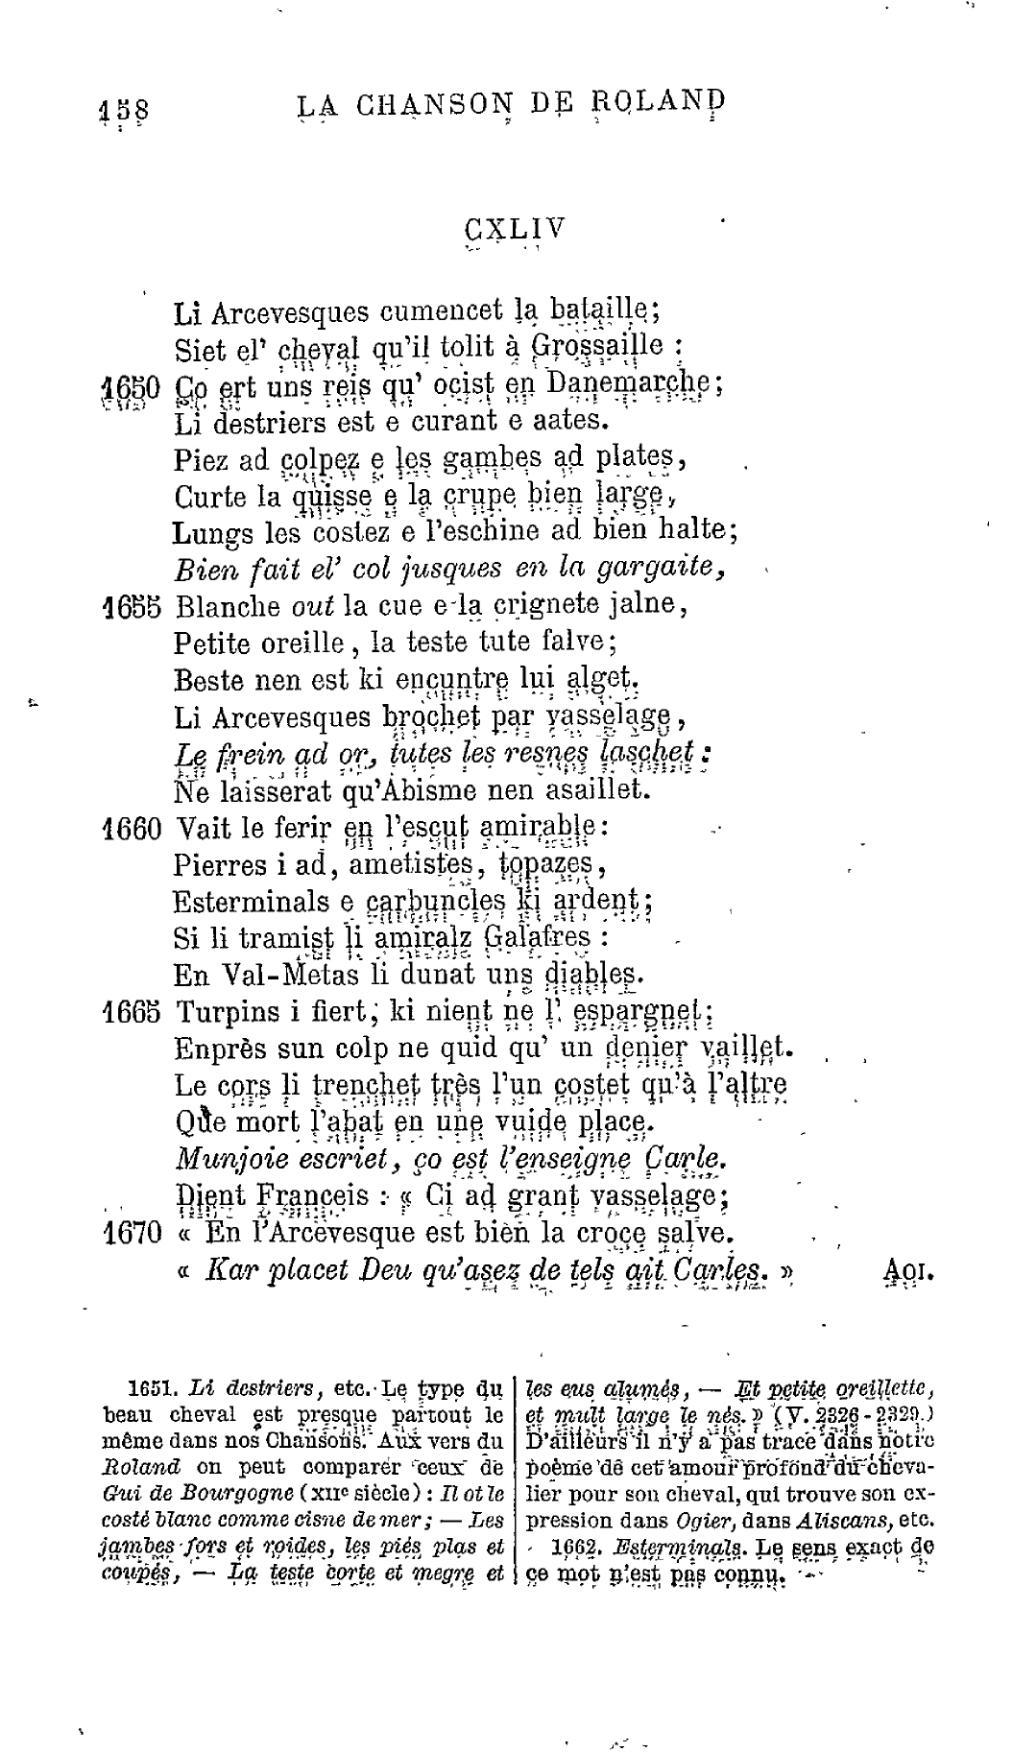 Chanson De Roland Onzieme Edition 1881.djvu